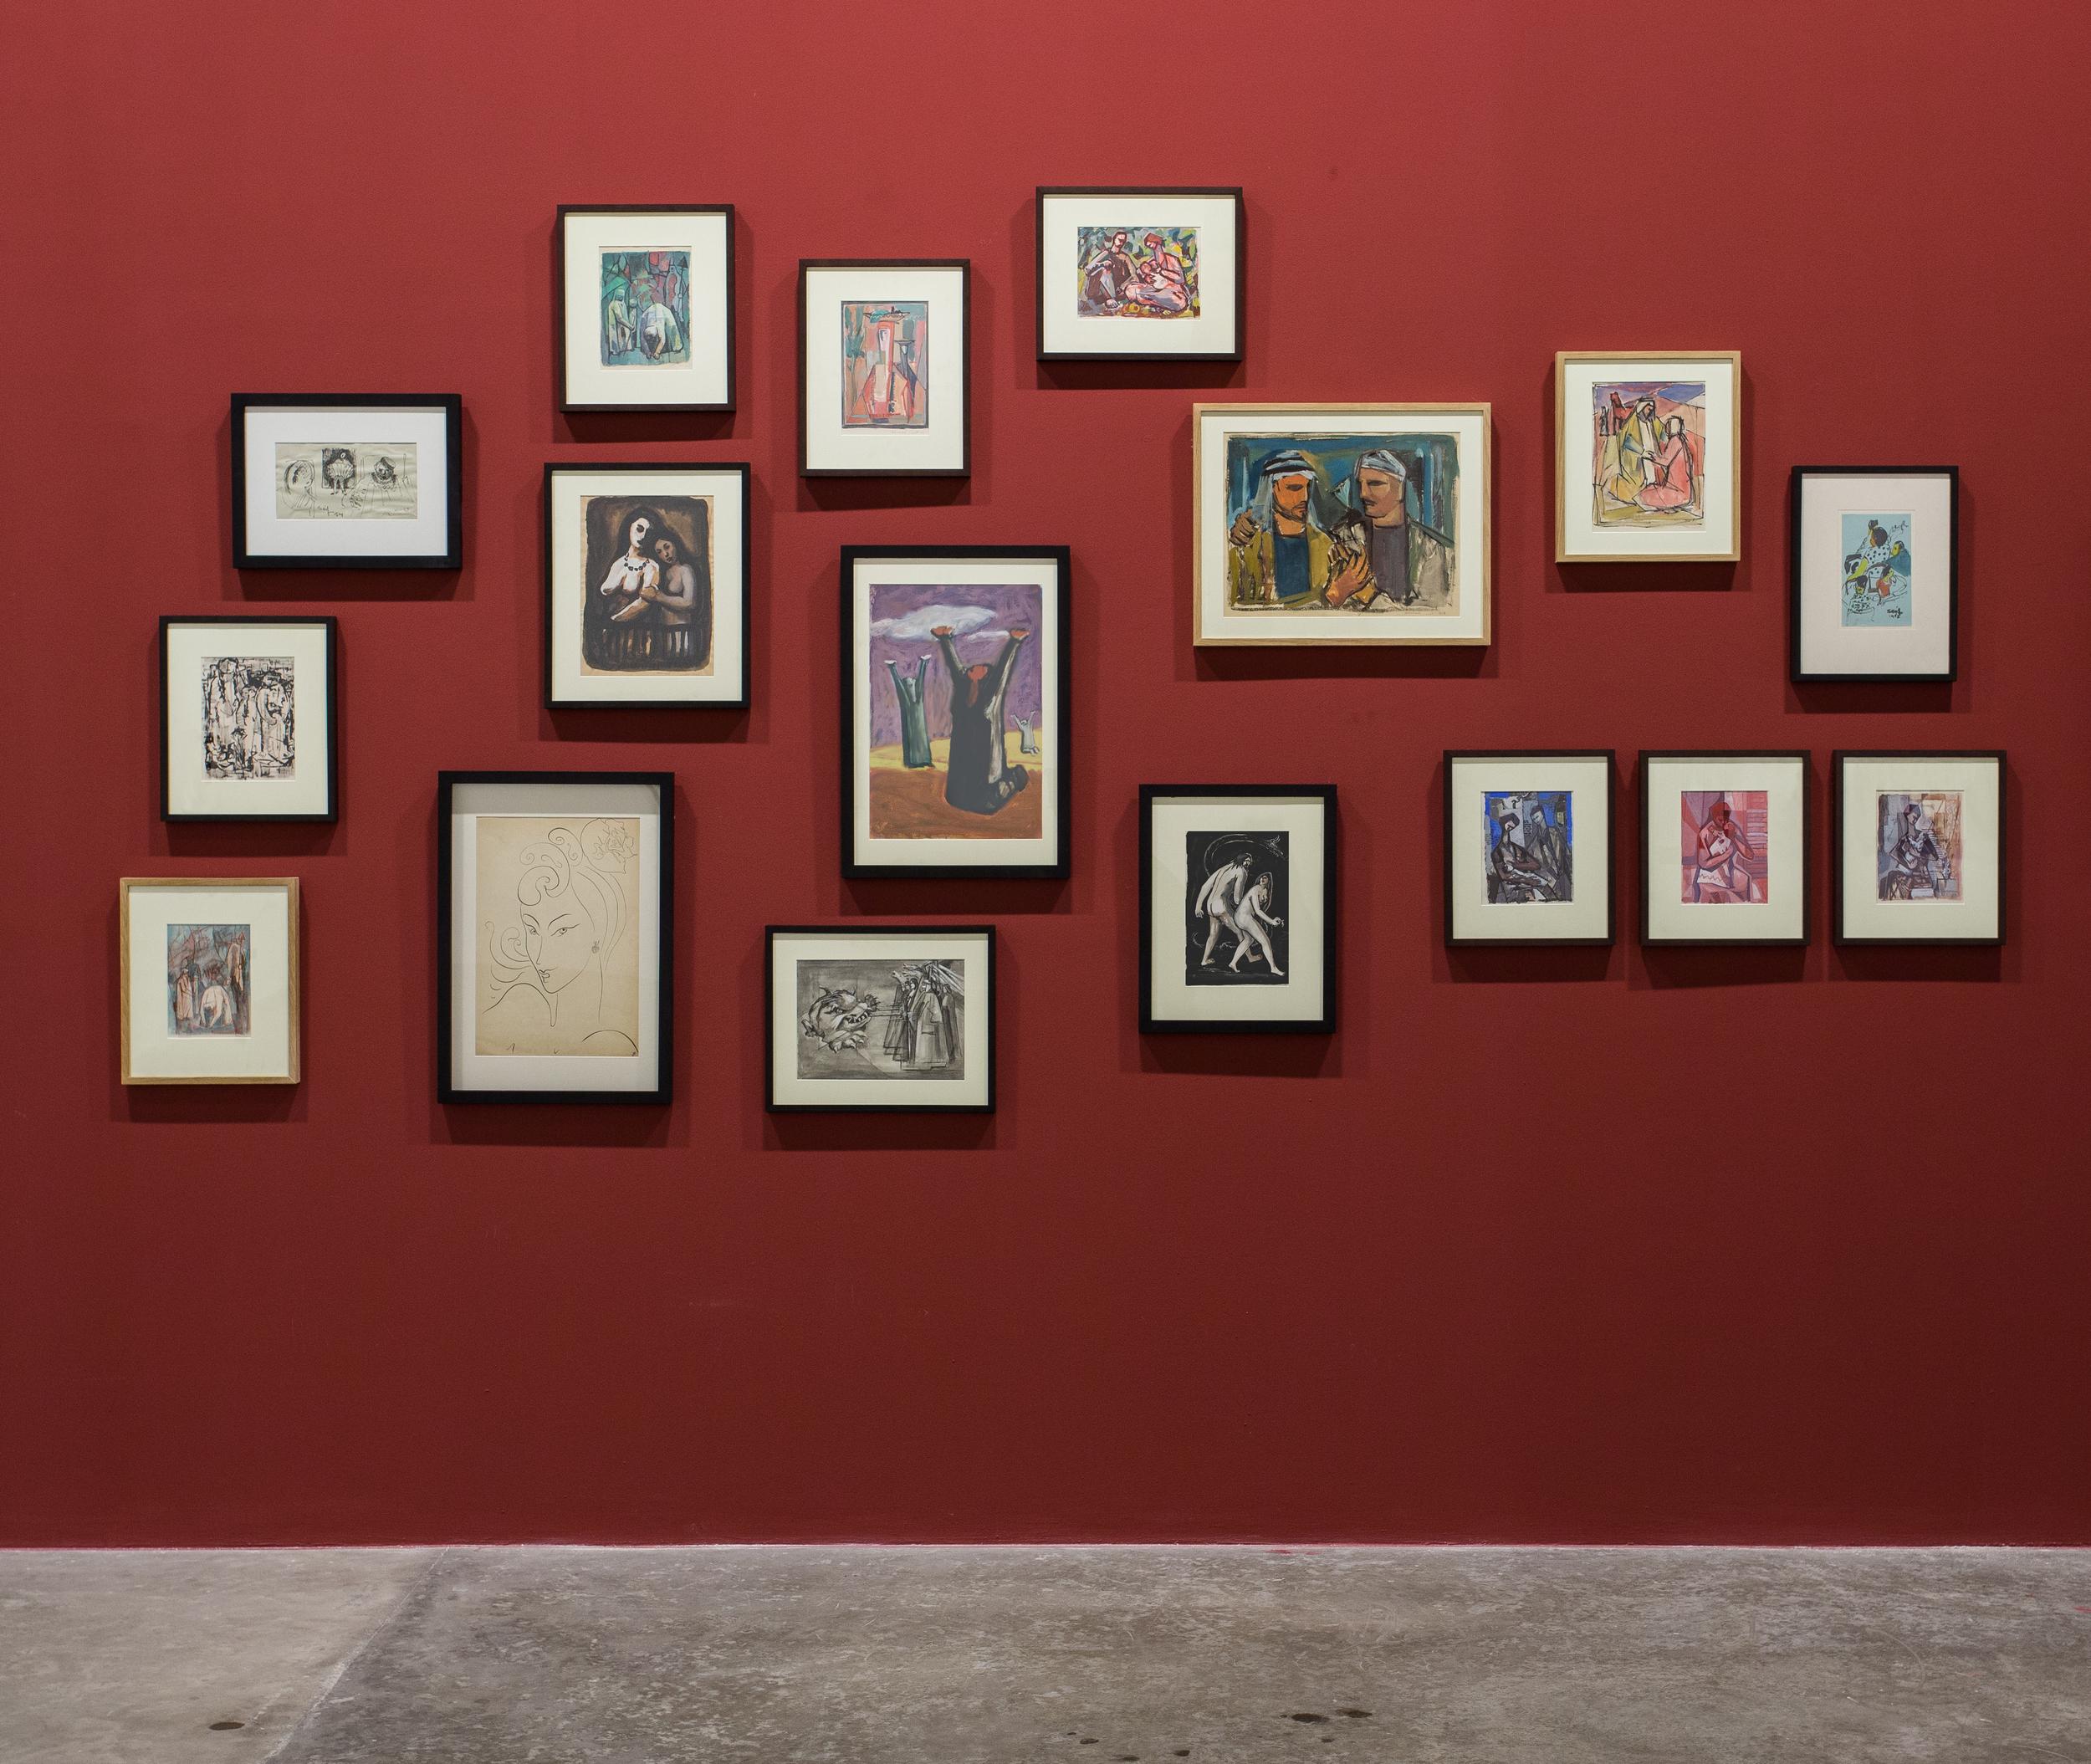 Mahmoud Hammad at Art Green Gallery, Dubai. HIKAYAT, 15 September- 26 October 2014